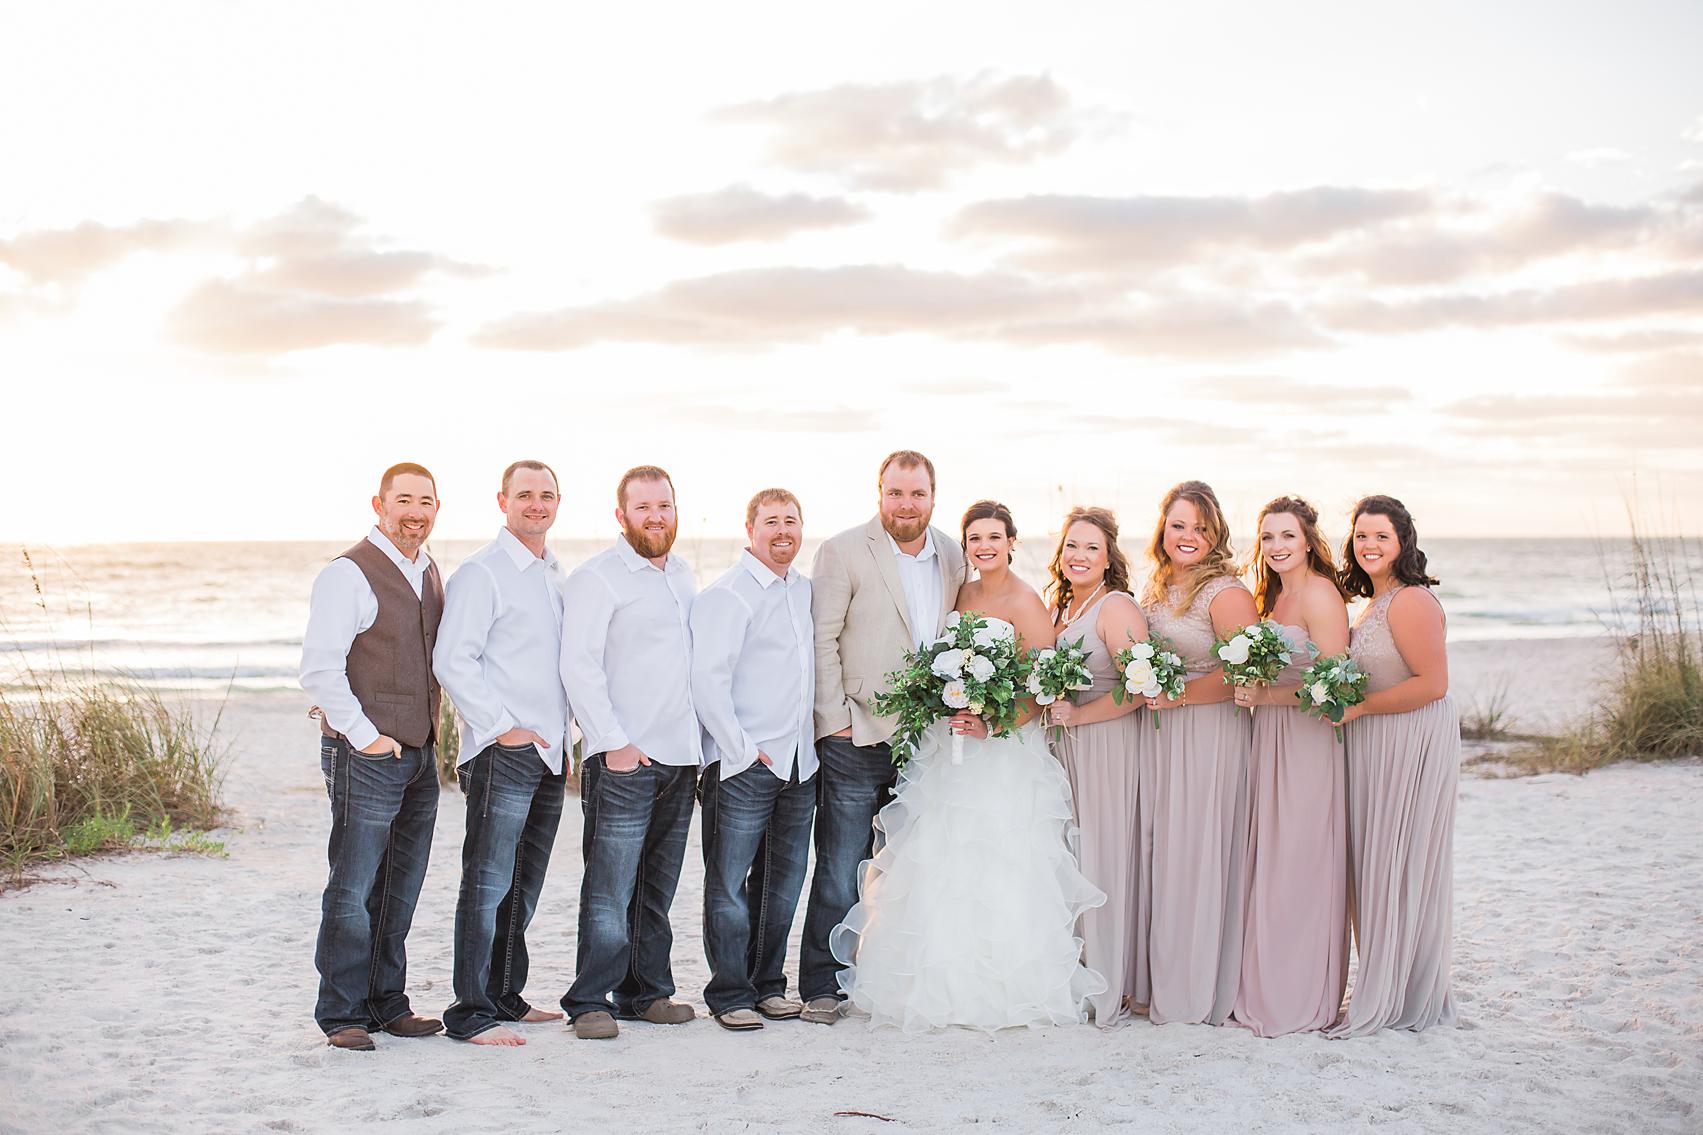 Bailey + Chalin - Anna Maria Island Wedding Photographer - Destination Wedding Photography - Emily & Co. Photography - Beach Wedding Photography 12.jpg